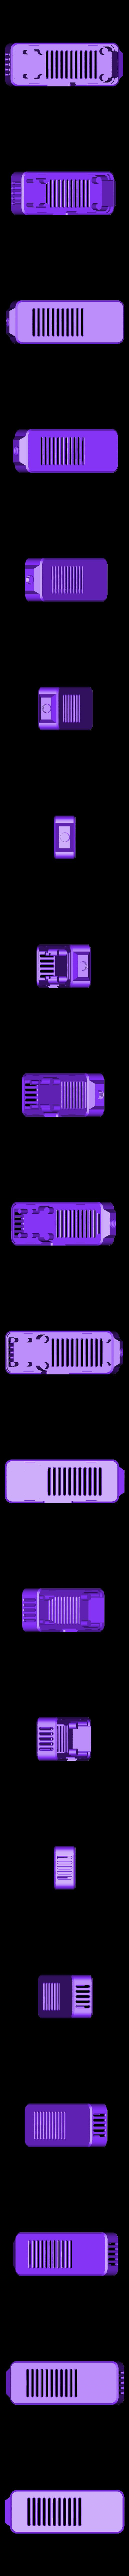 Body.stl Download free STL file Homekit Camera Case (HKCam) • 3D printable model, mkoistinen